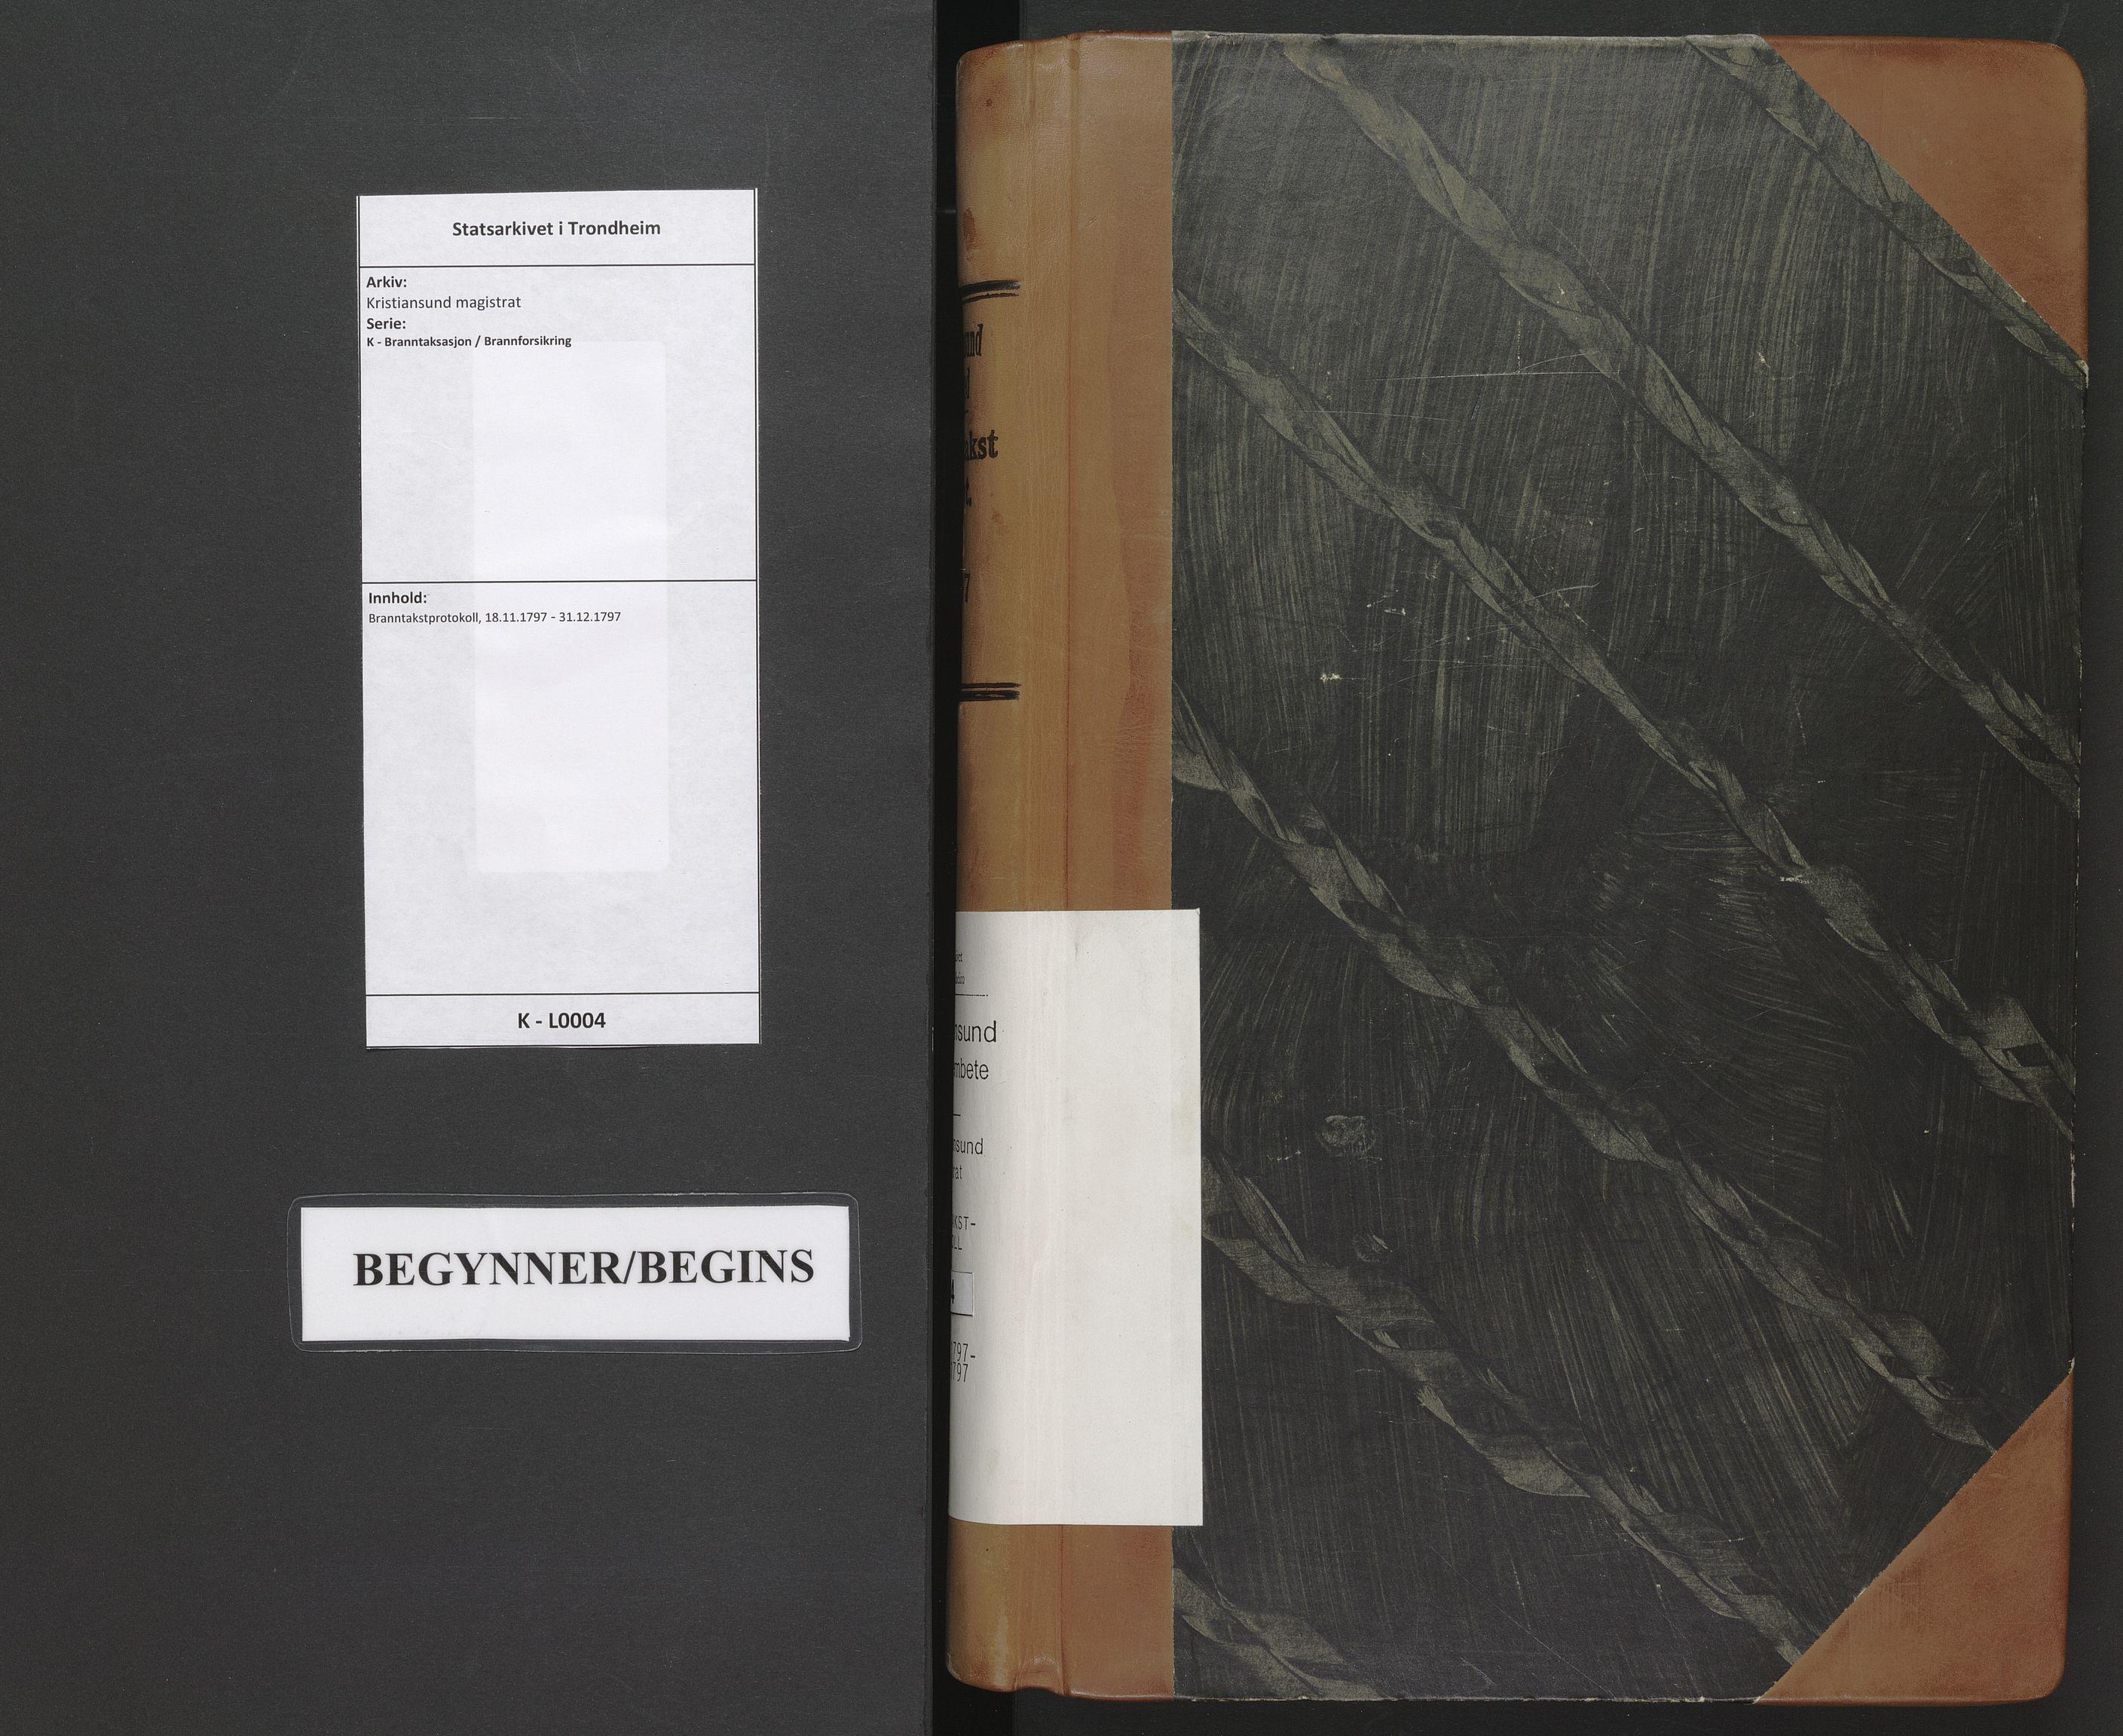 SAT, Kristiansund magistrat, K/L0004: Branntakstprotokoll, 1797